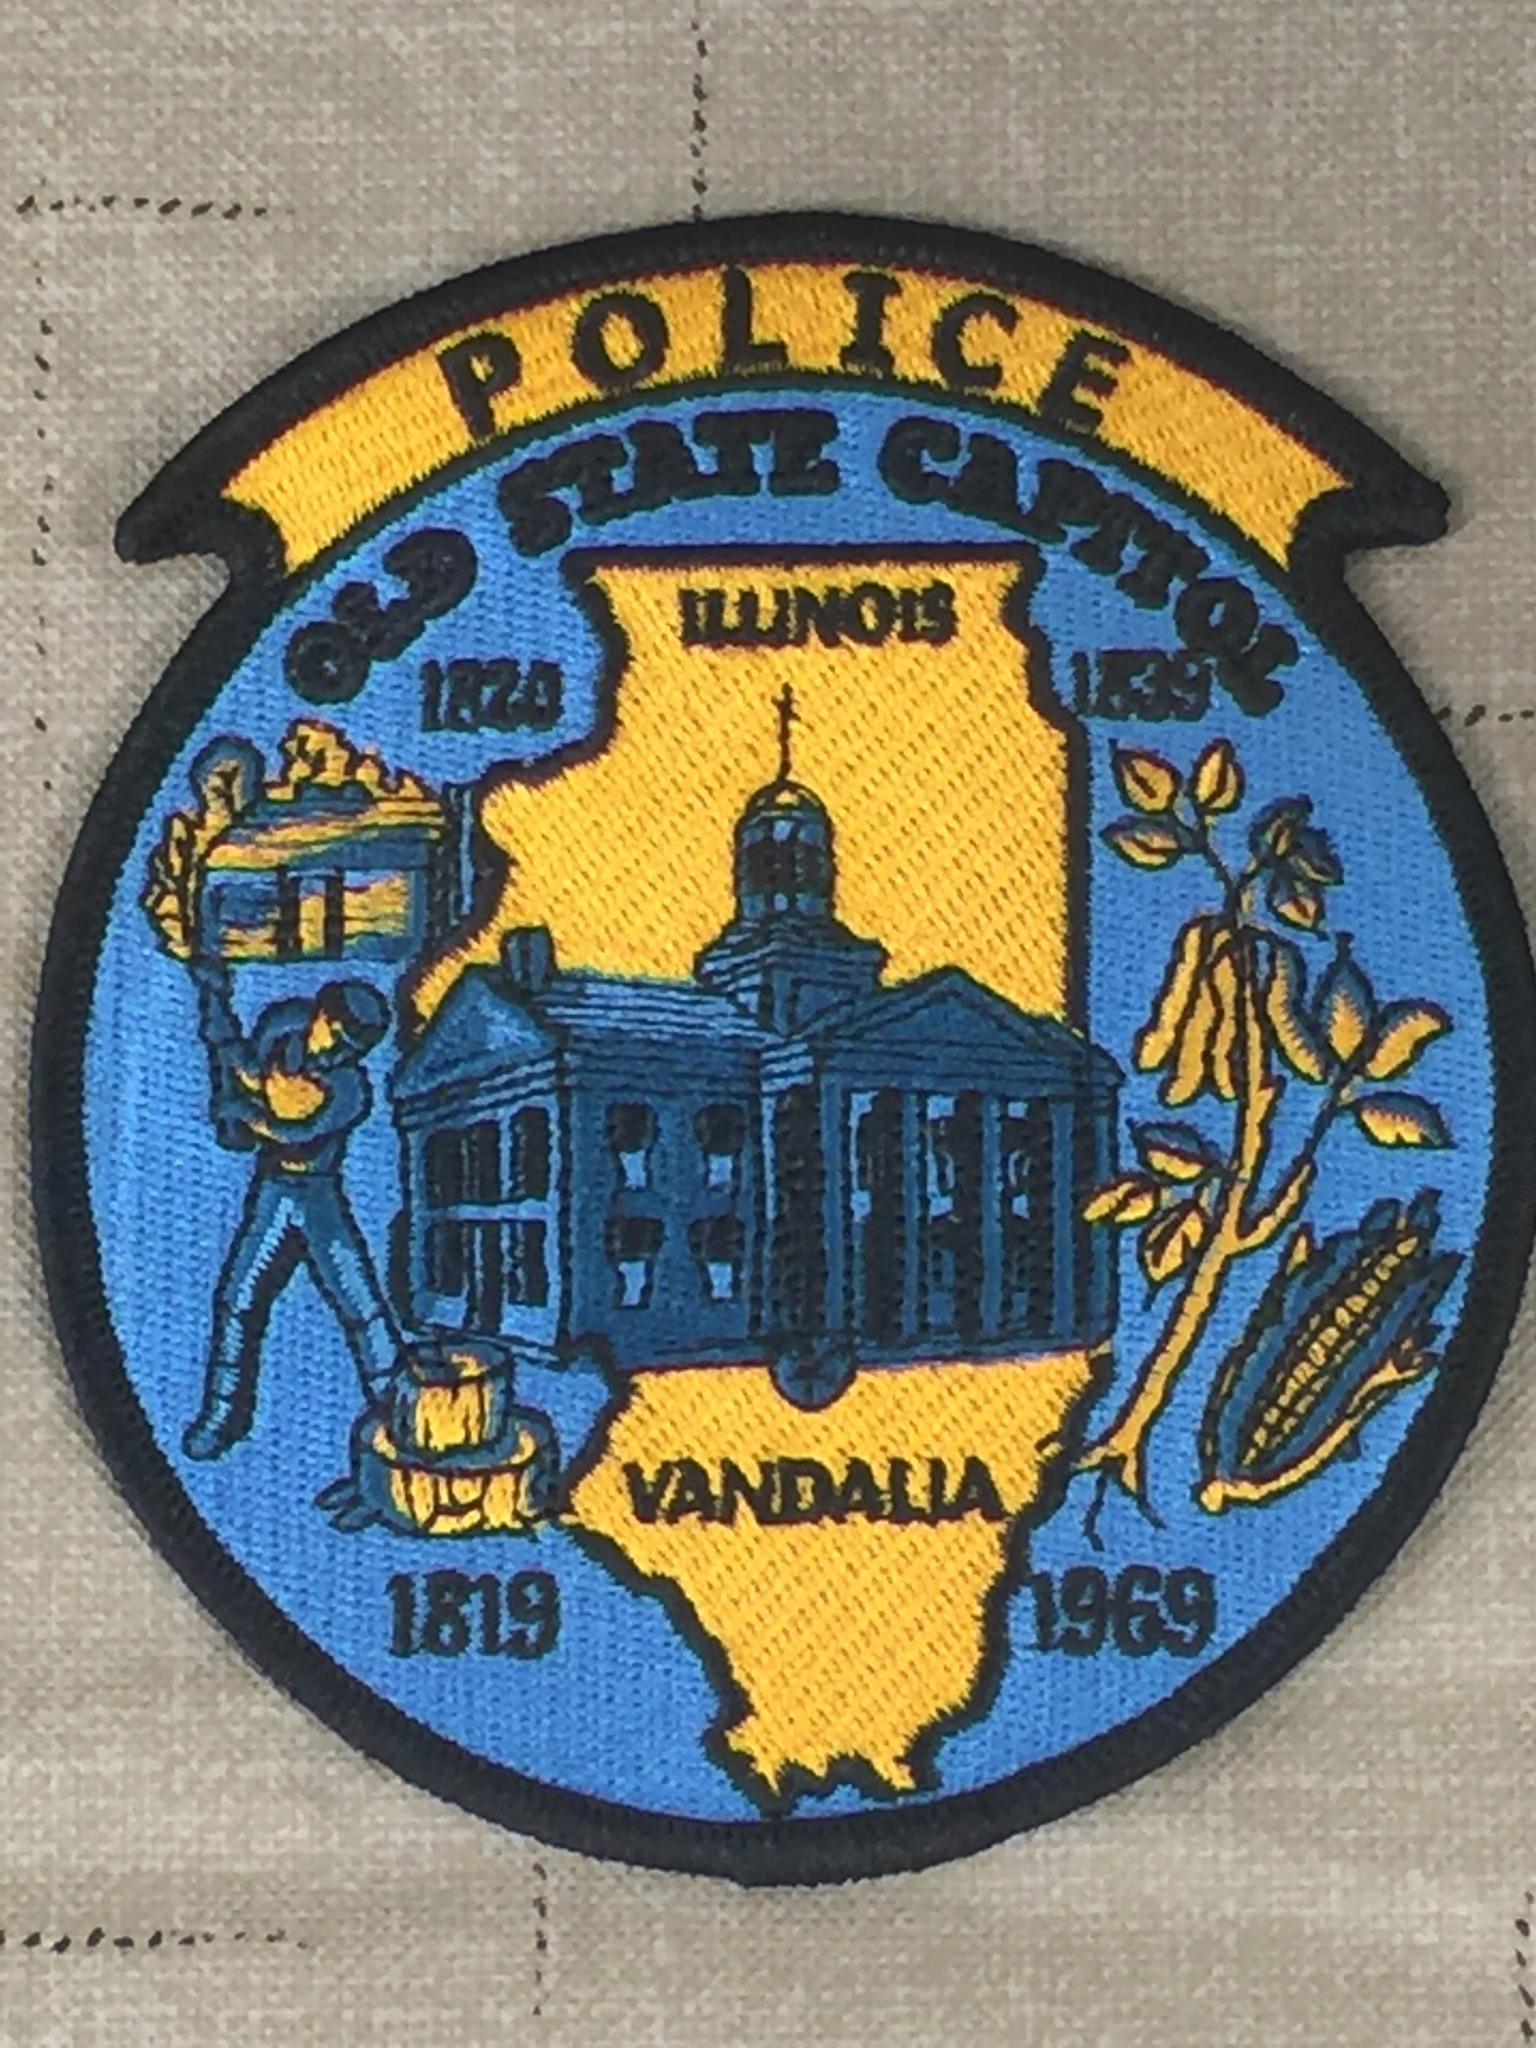 Vandalia PD handling several reports of burglary to vehicles on Thursday